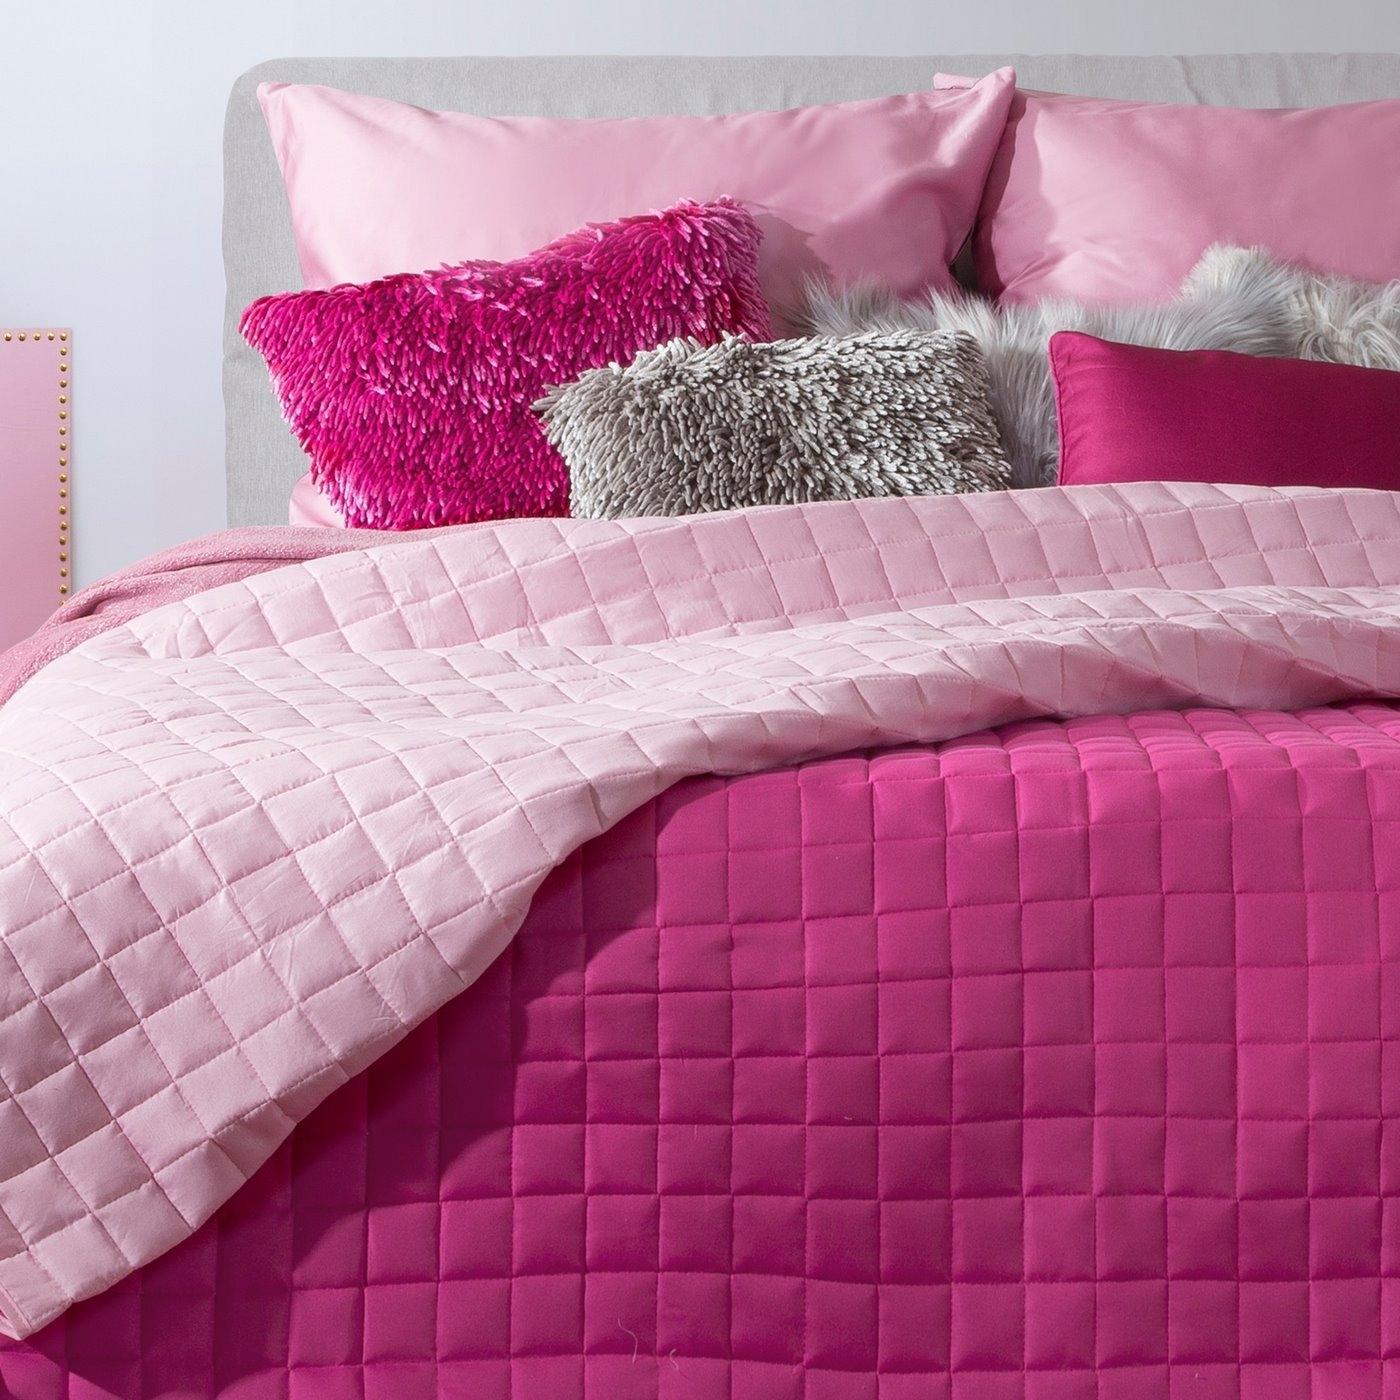 Cuvertura reversibila Eva Fuchsia / Light Pink, 220 x 240 cm